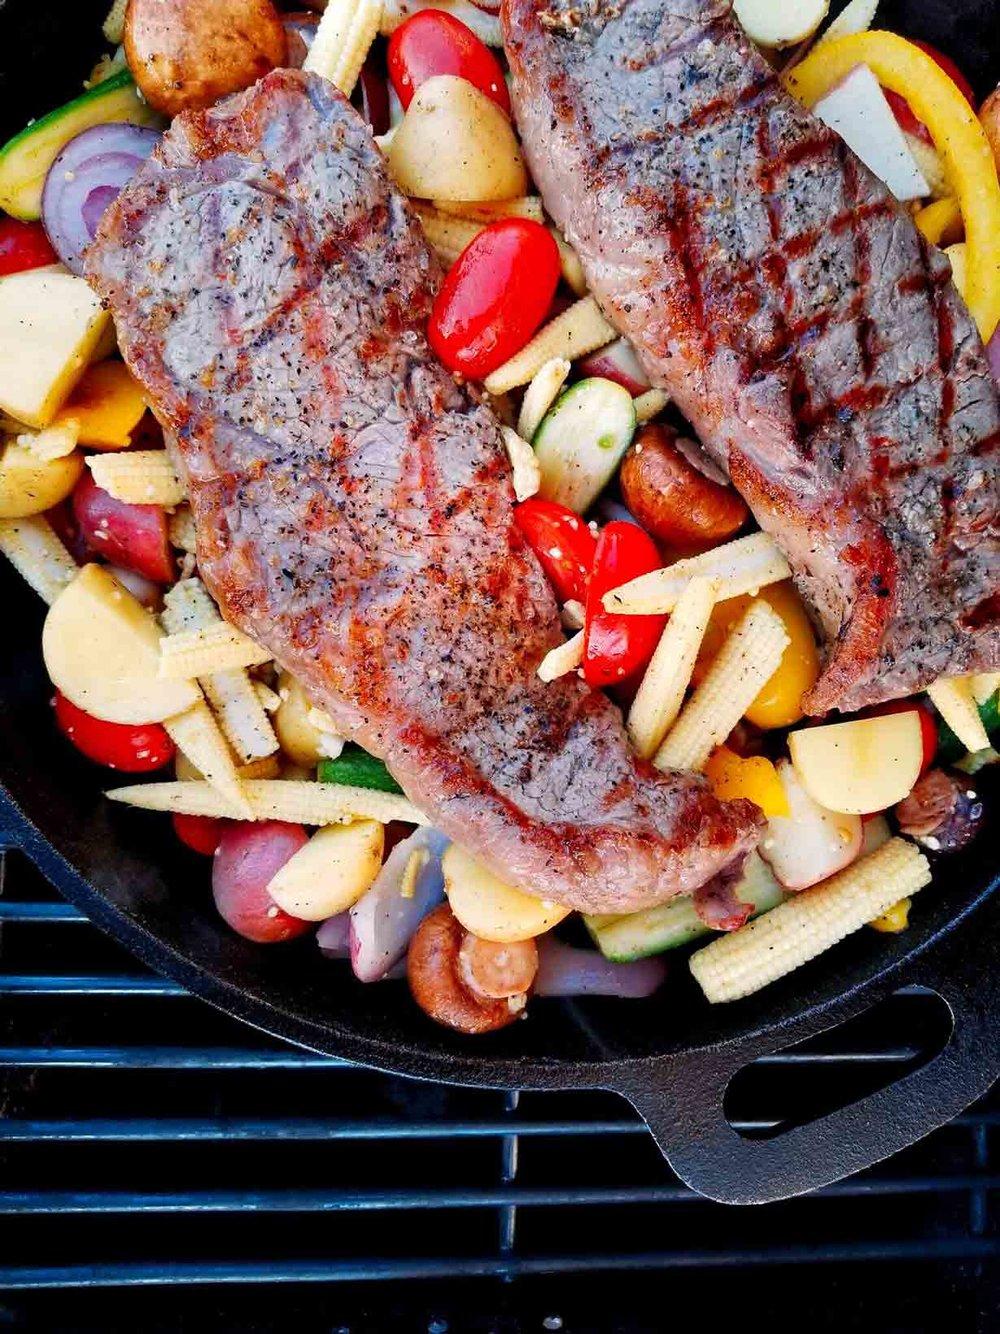 ashly-locklin-mohter-of-dragons-fire-grilled-steak-with-garlic-veggies.jpg